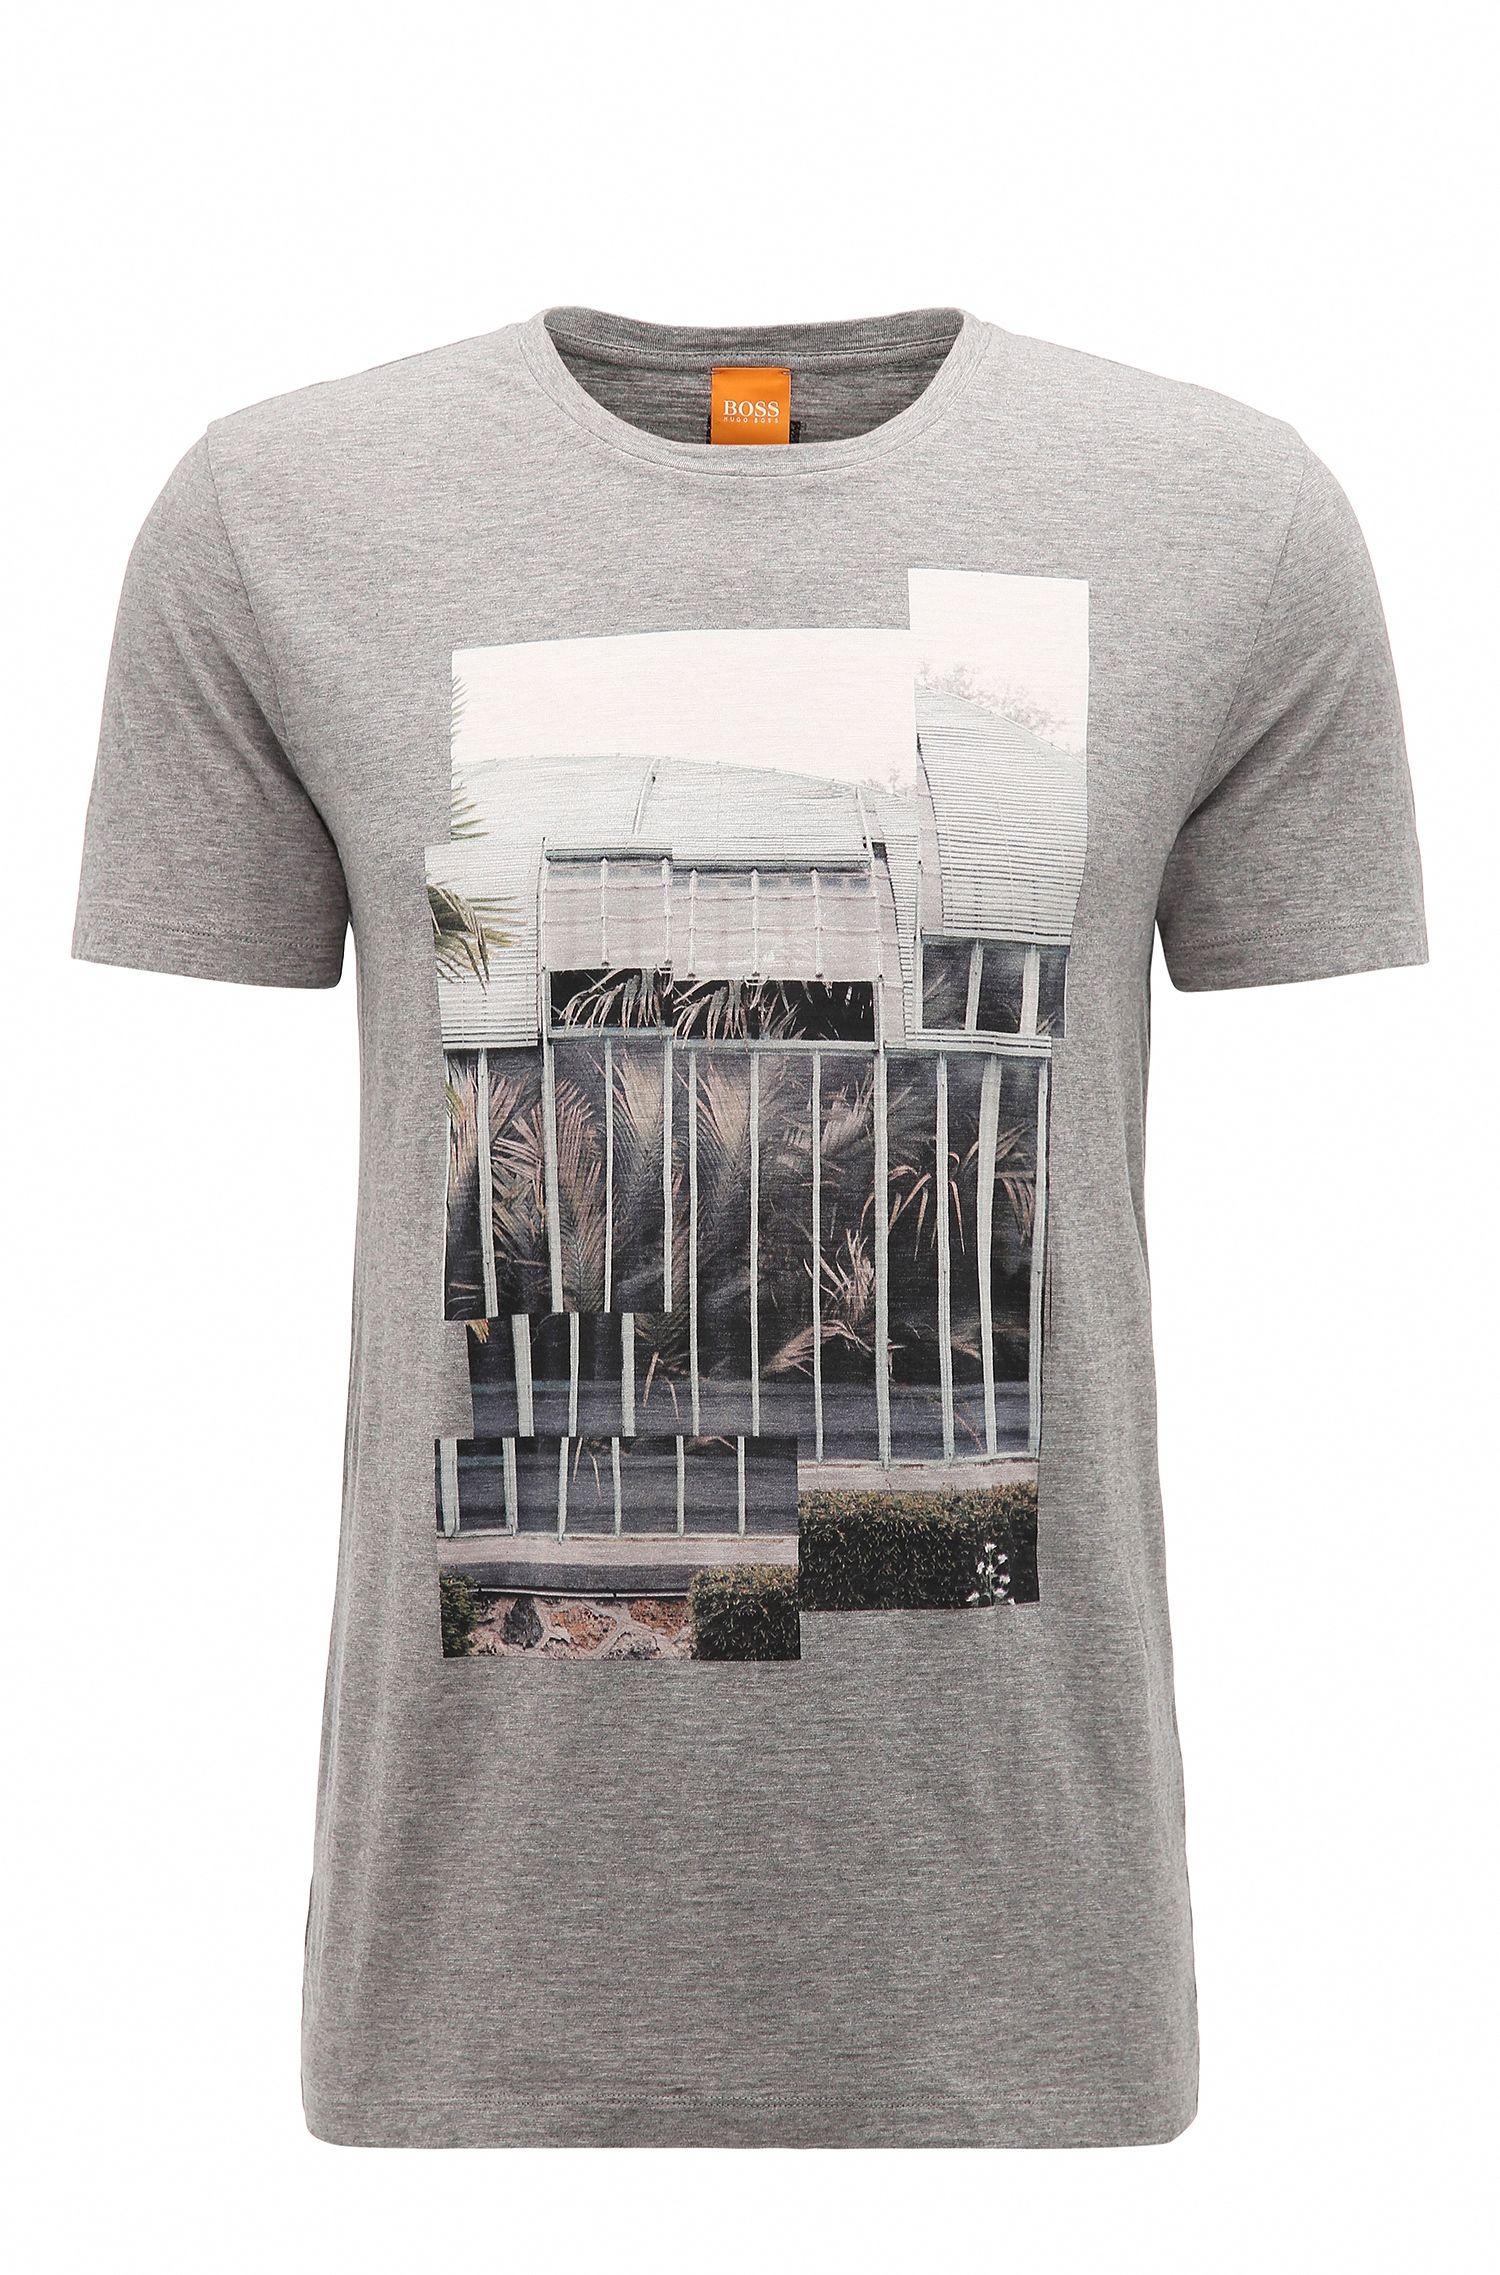 'Tonight' | Cotton Jersey Graphic T-Shirt